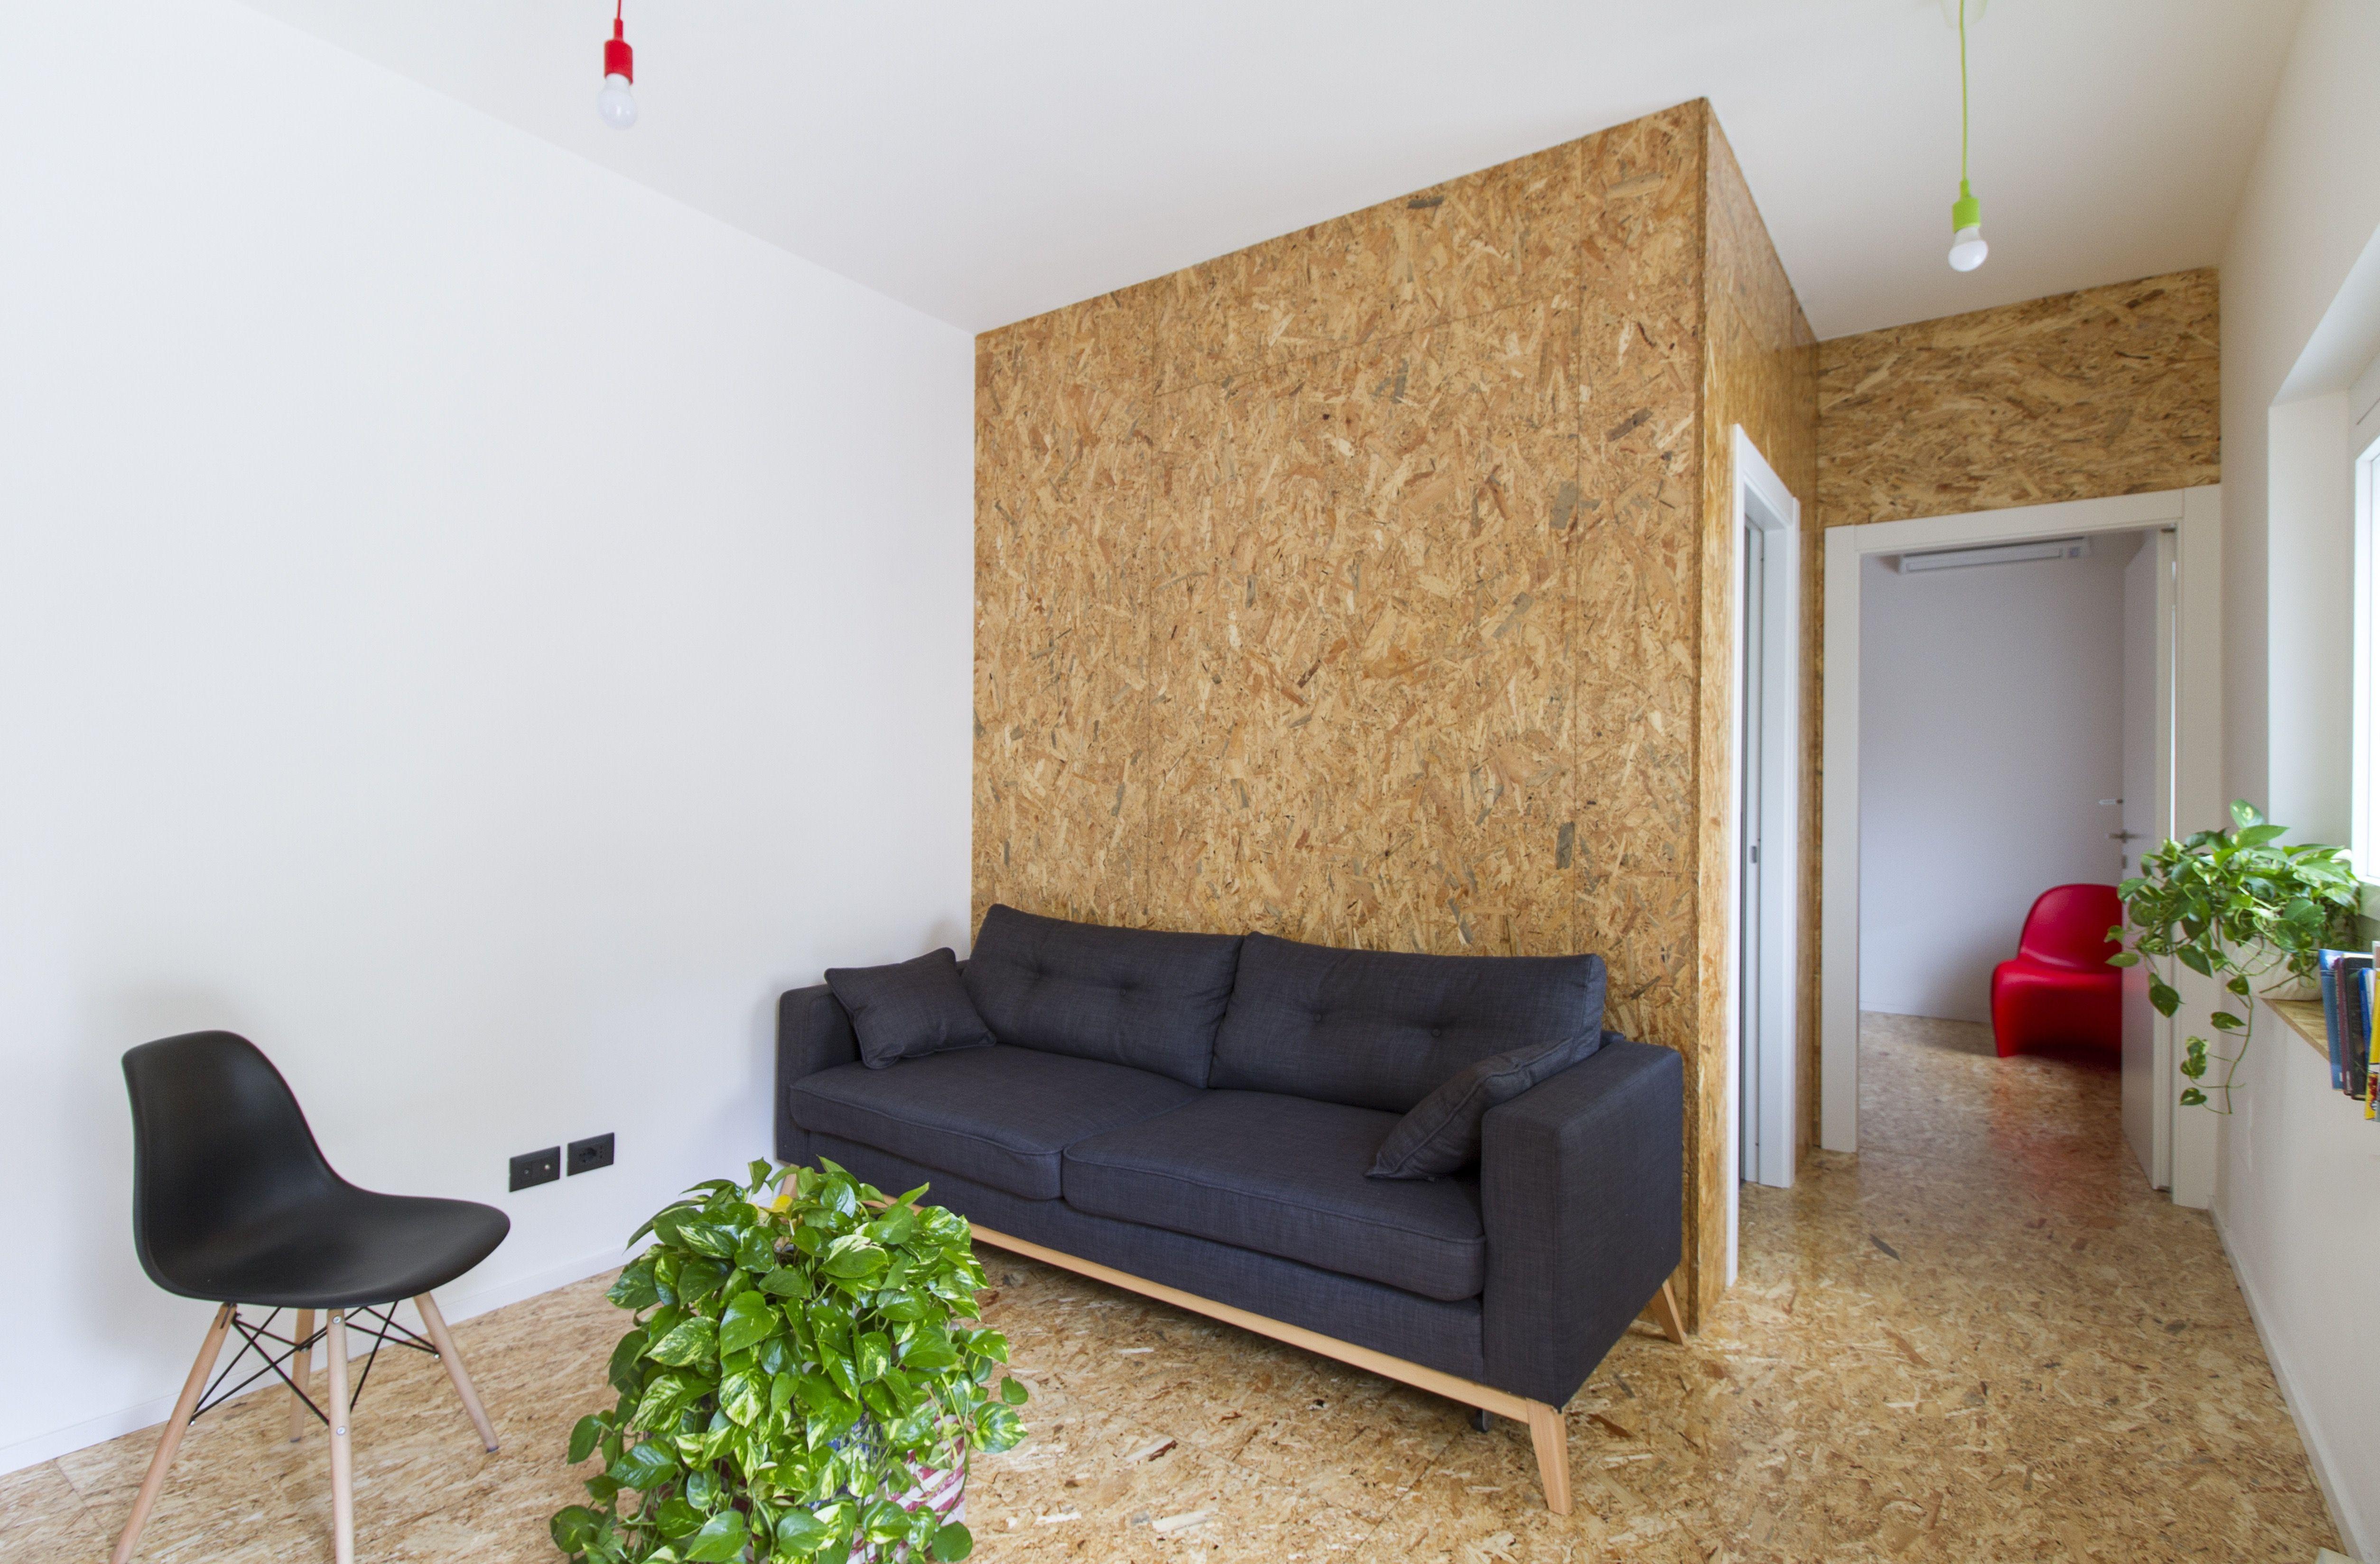 Rénovation osb #osb #wood #rénovation